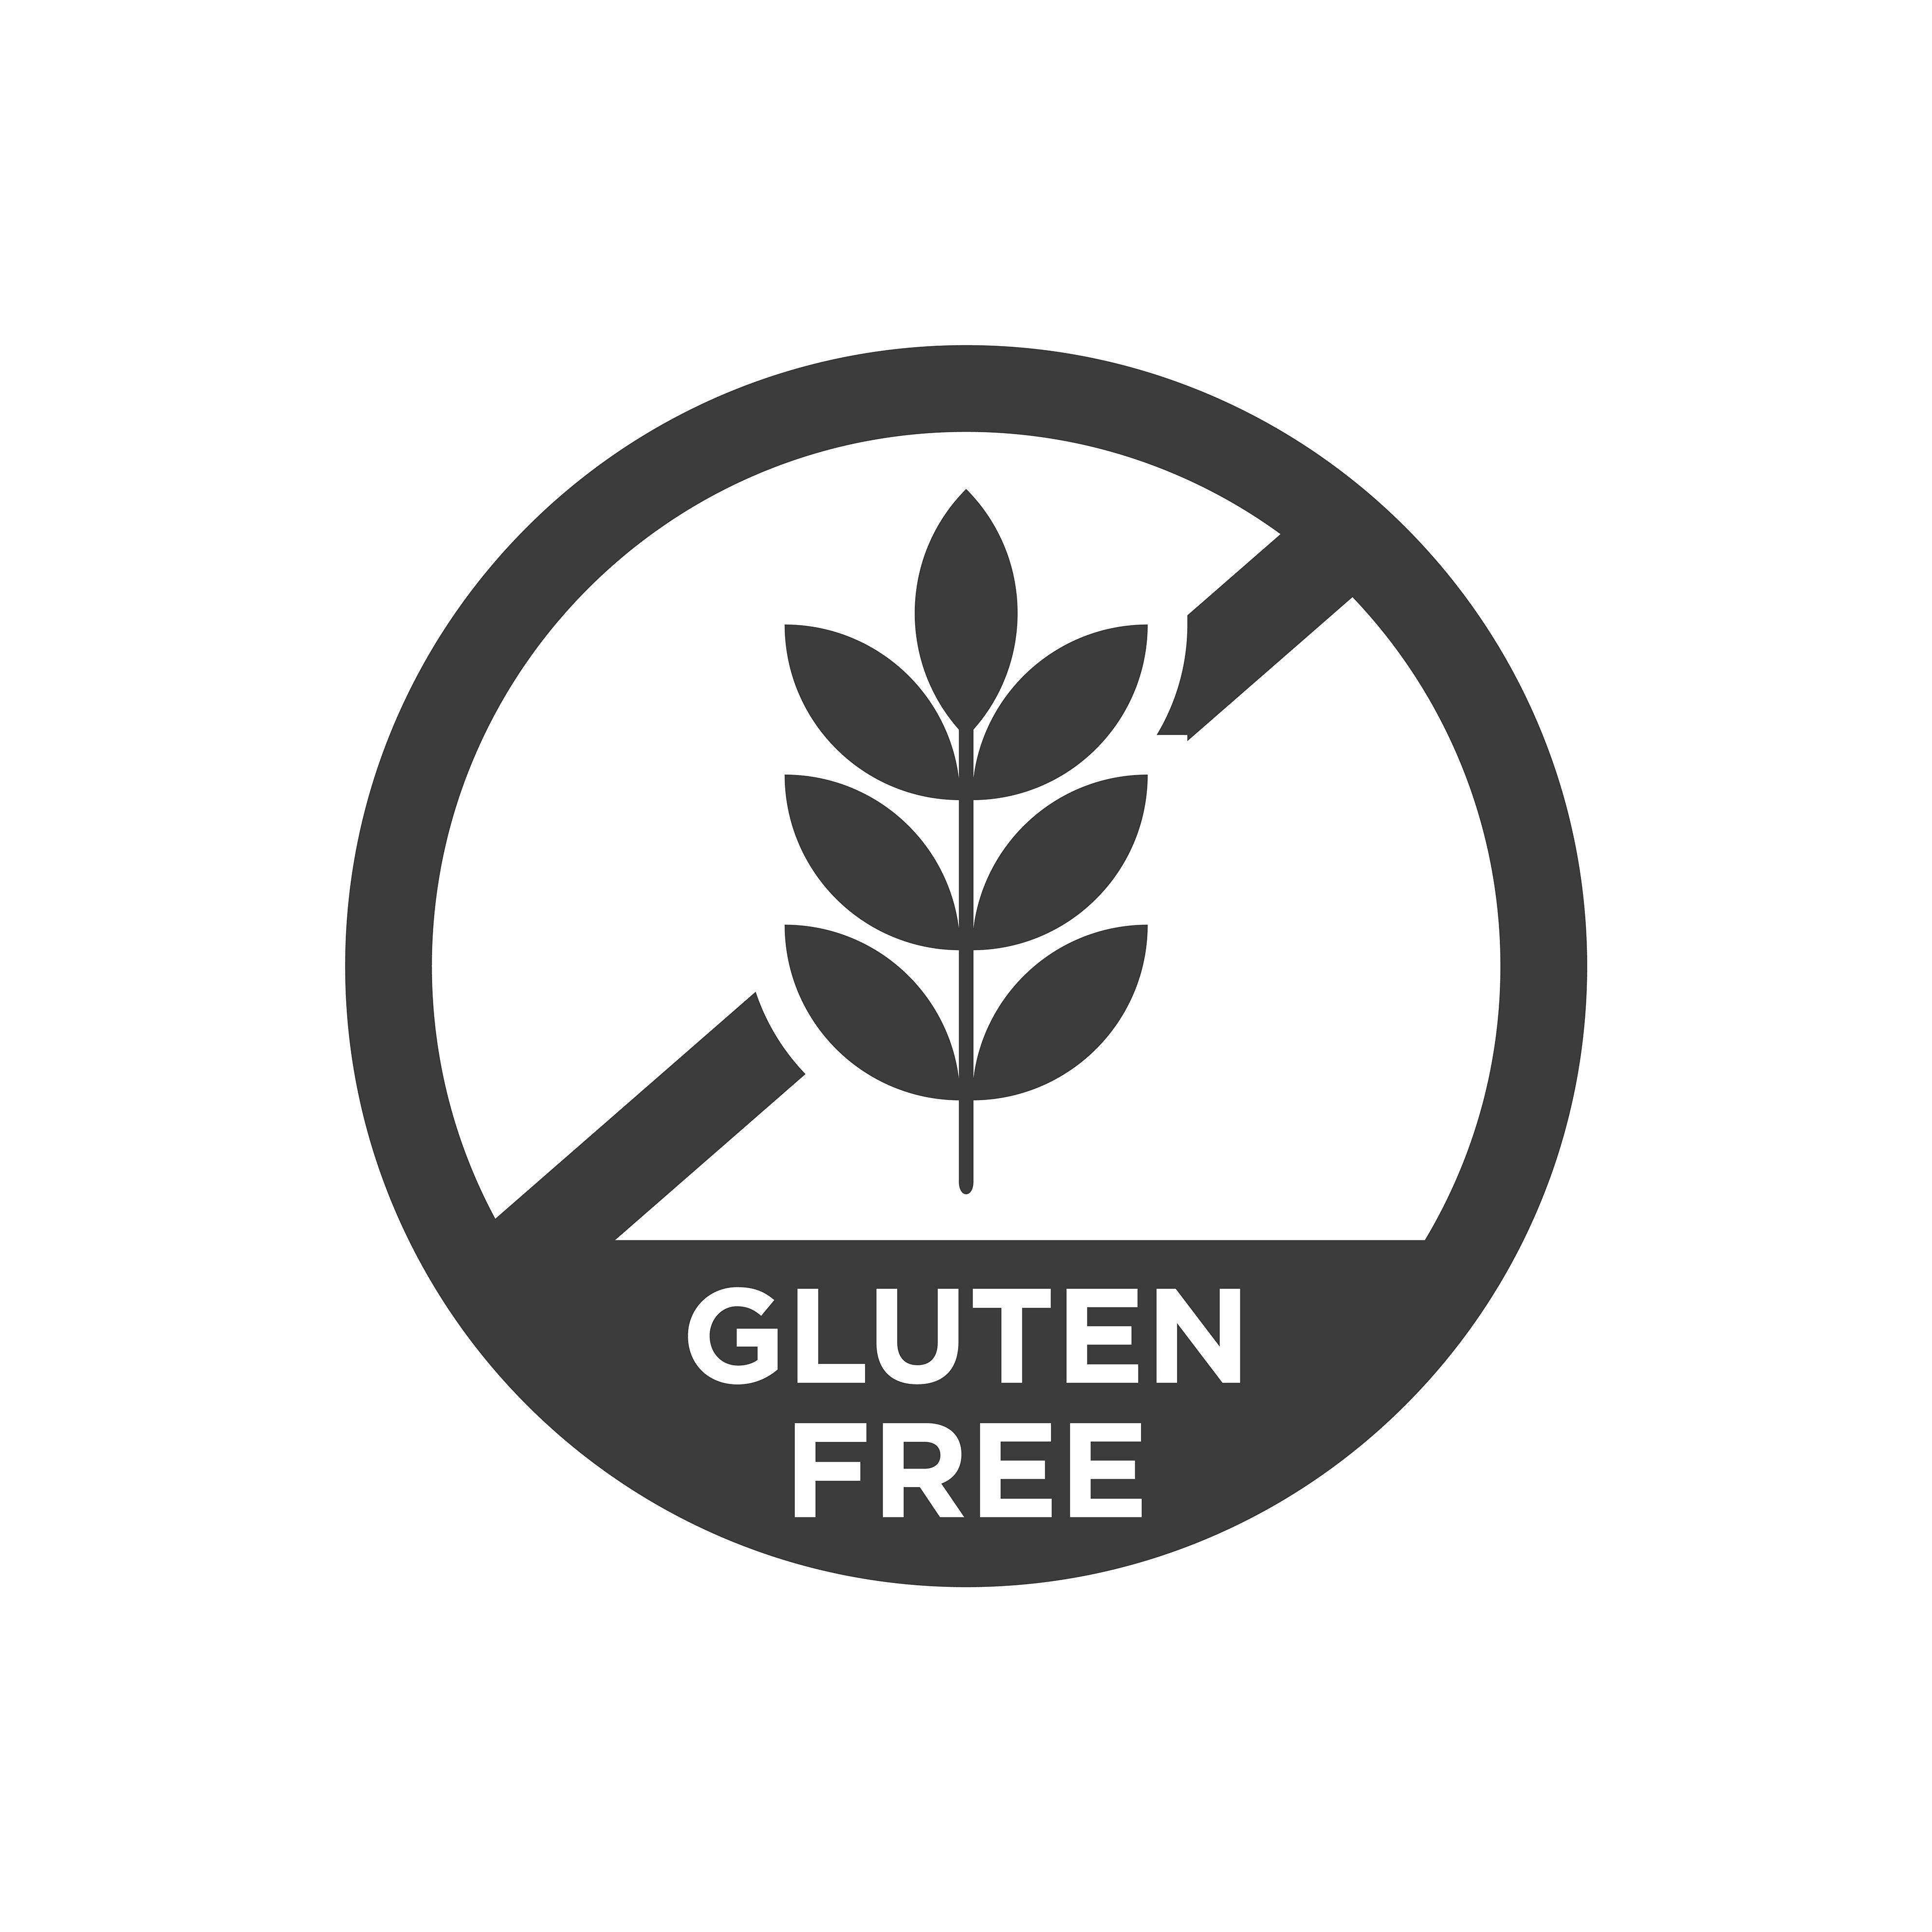 Gluten Free Vector Art.